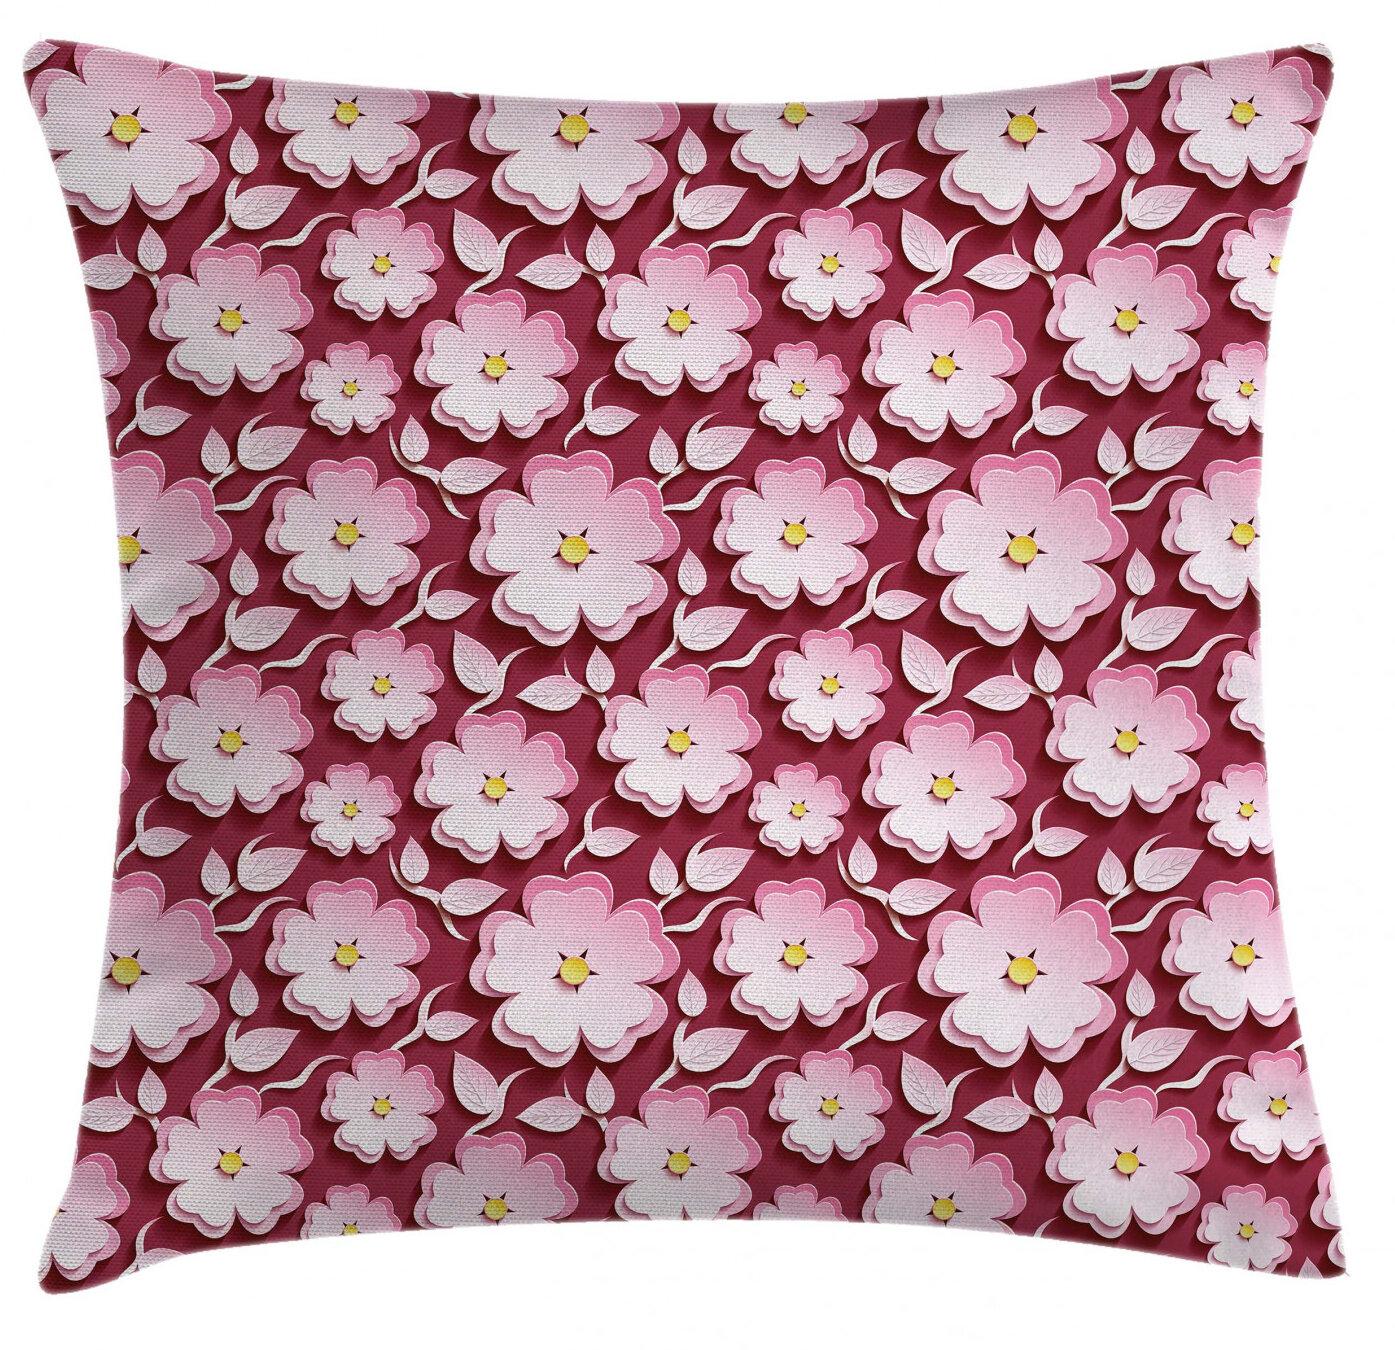 East Urban Home Japanese Cherry Blossom Sakuraindoor Outdoor Floral 26 Throw Pillow Cover Wayfair